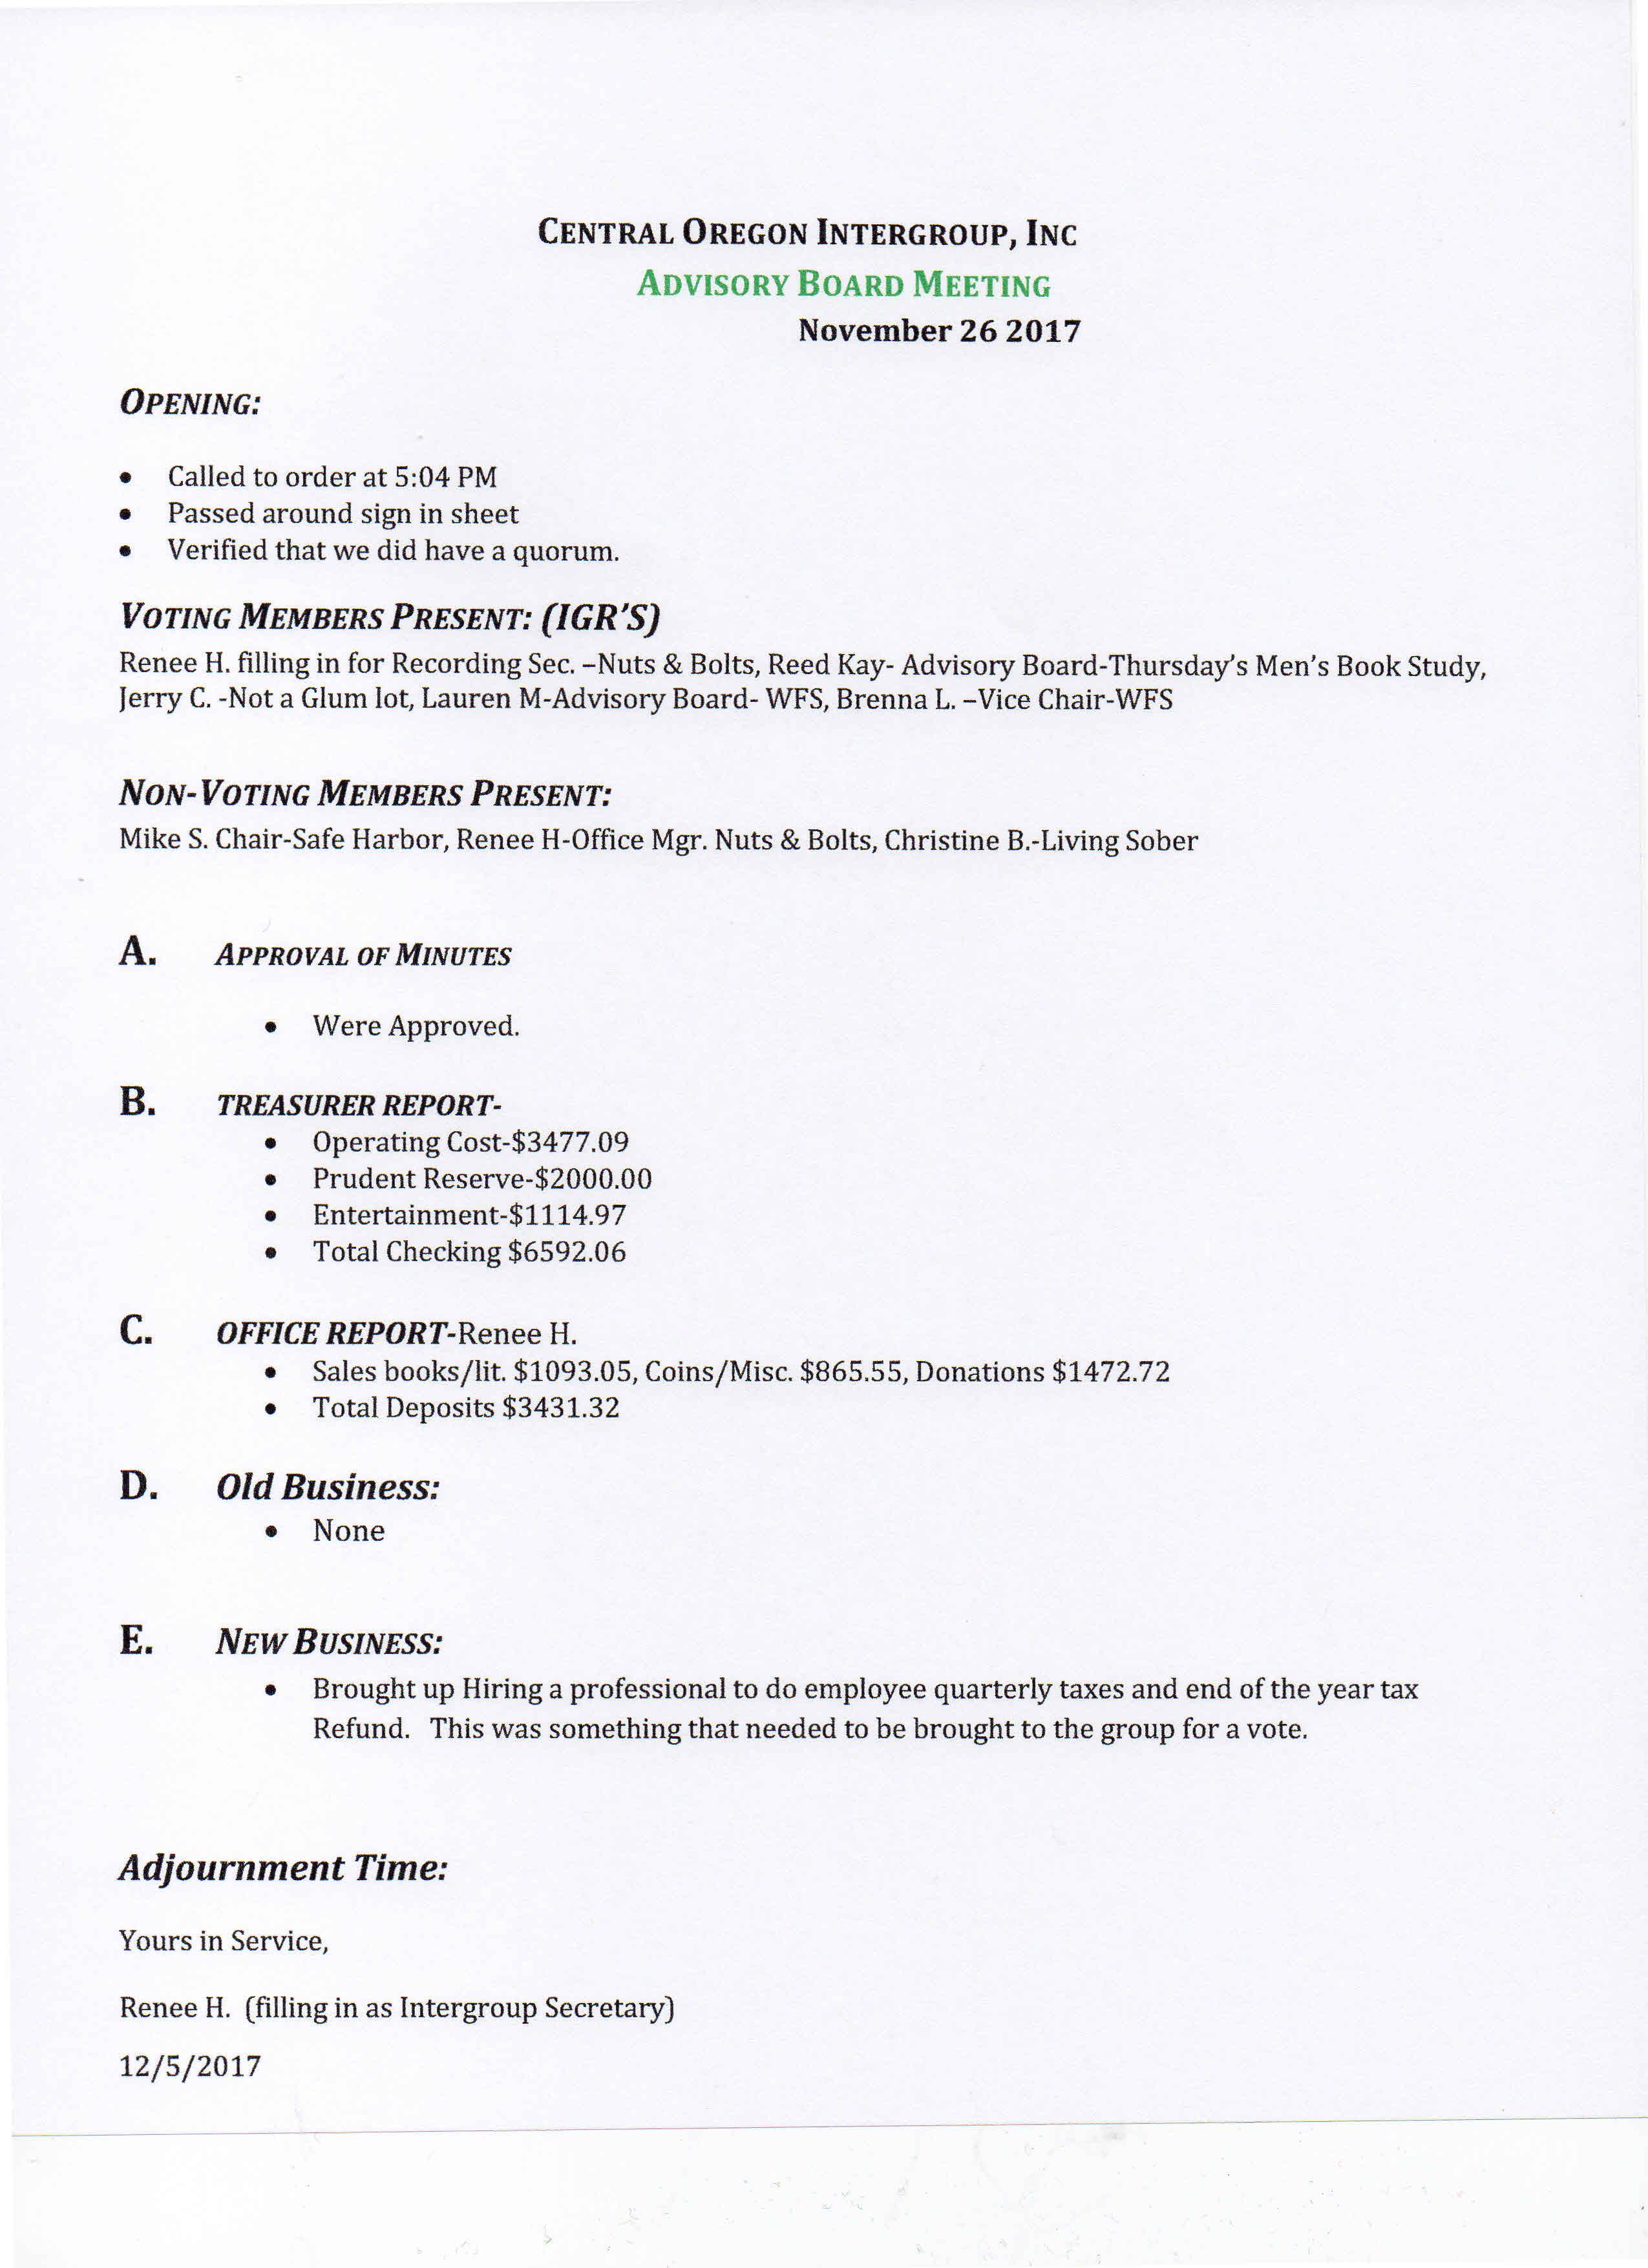 intergroup meeting minutes november 2017